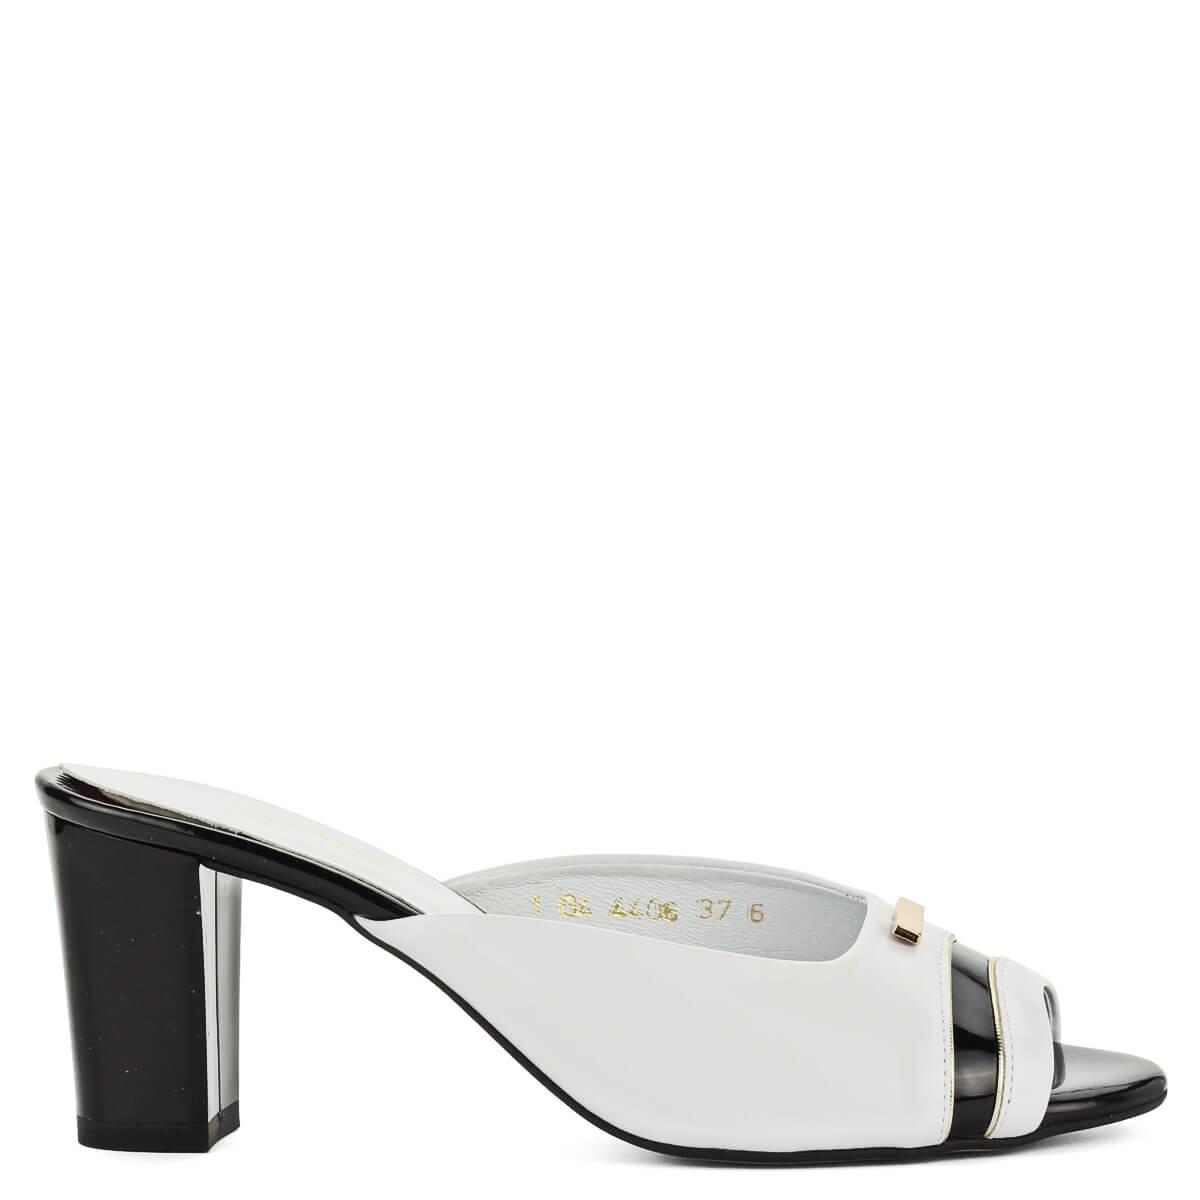 Magas sarkú papucs - Magas sarkú női papucsok online rendeléssel f6bb159f28